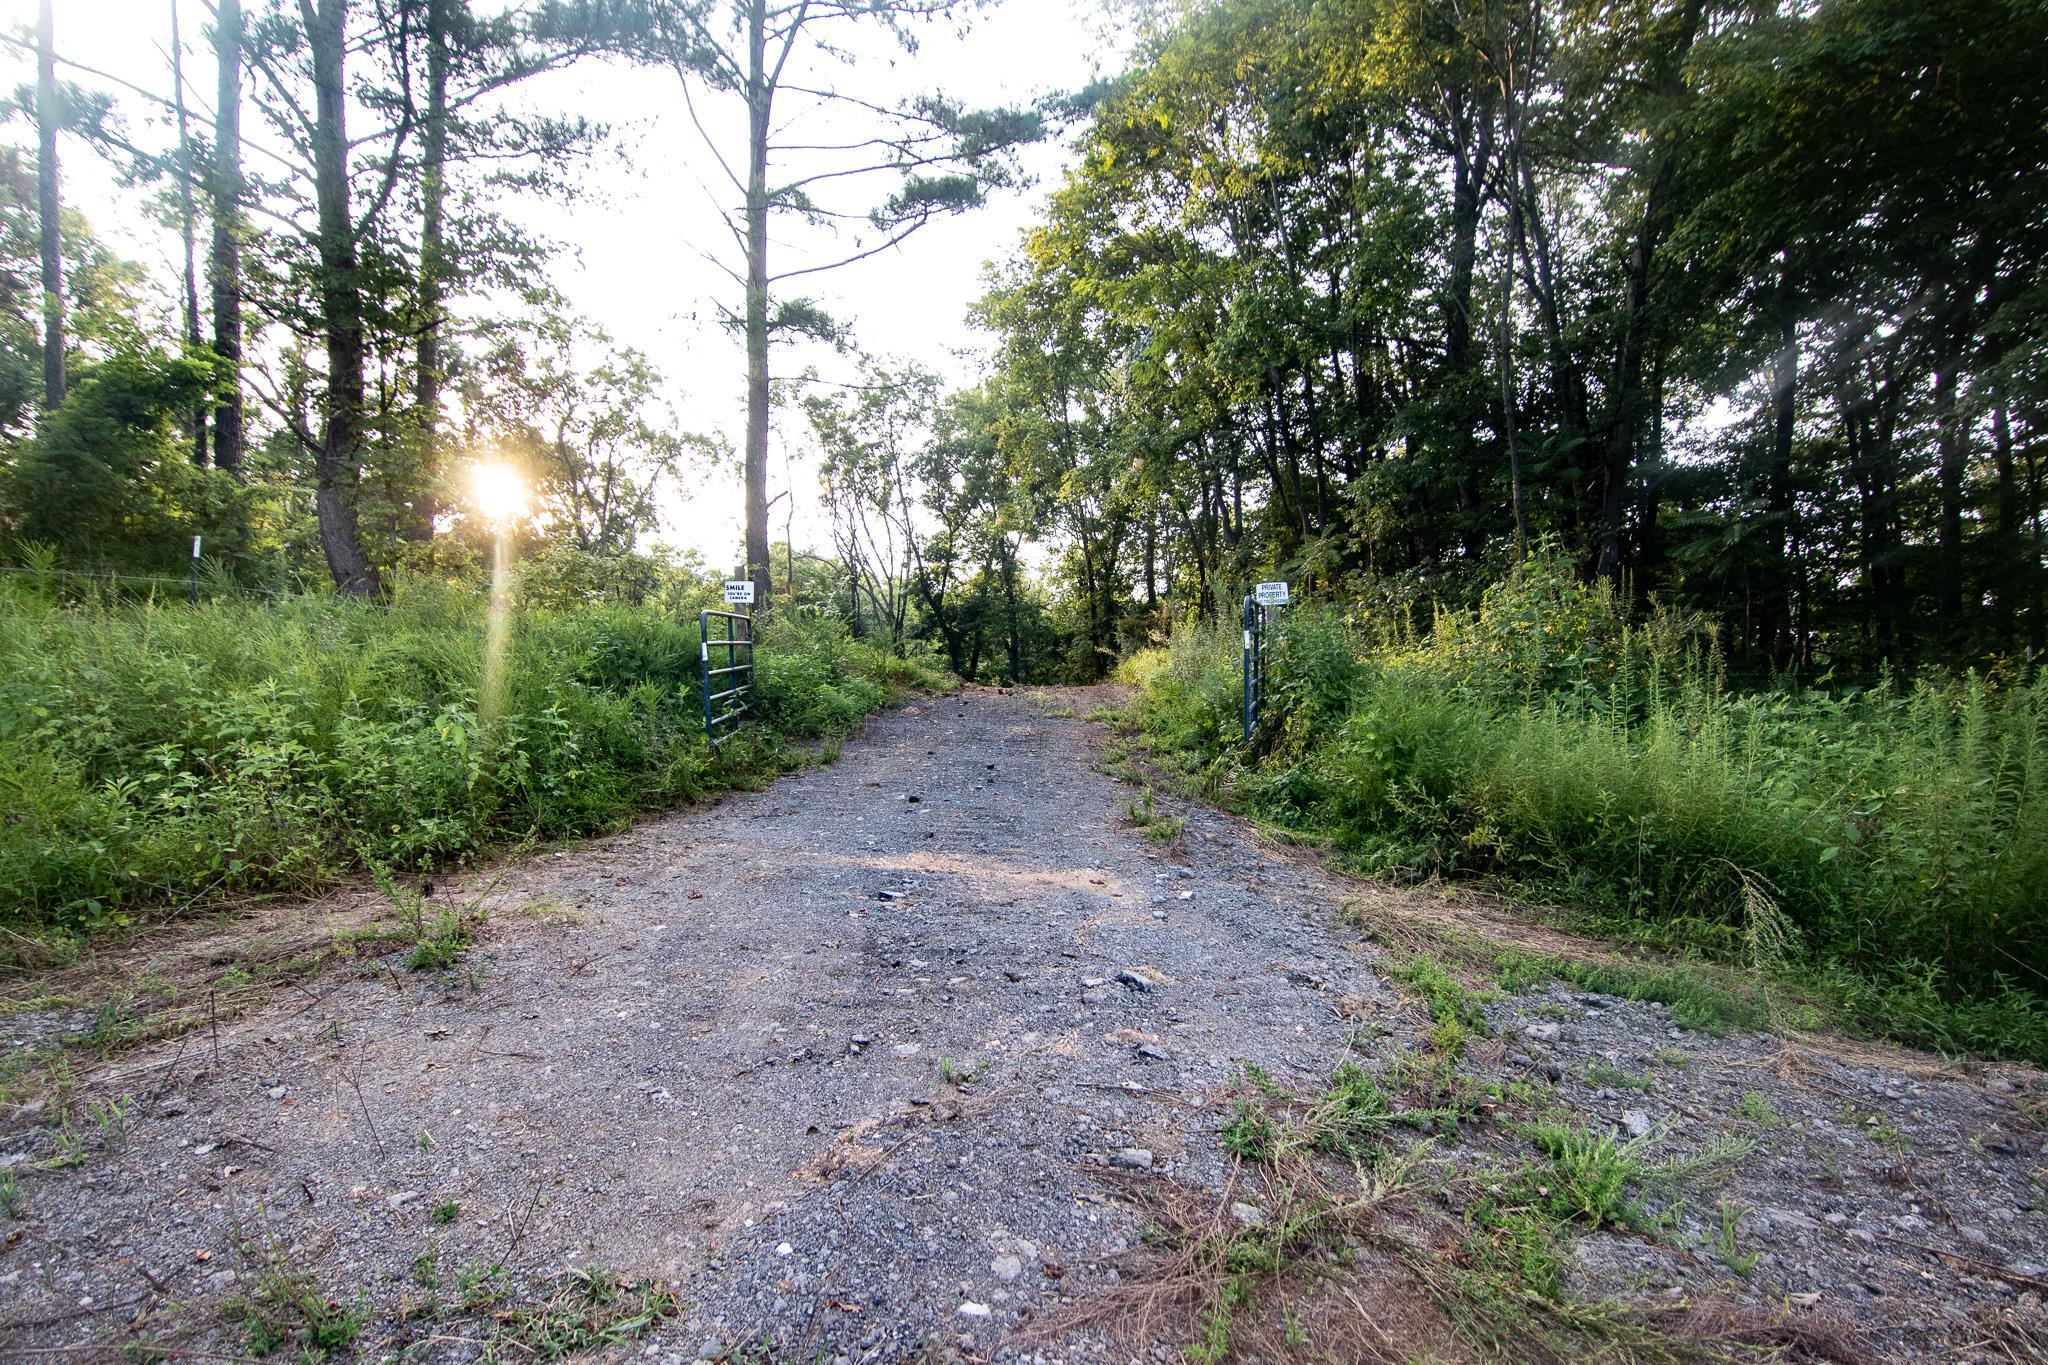 0 Sheboss Ridge Rd, Hampshire, TN 38461 - Hampshire, TN real estate listing